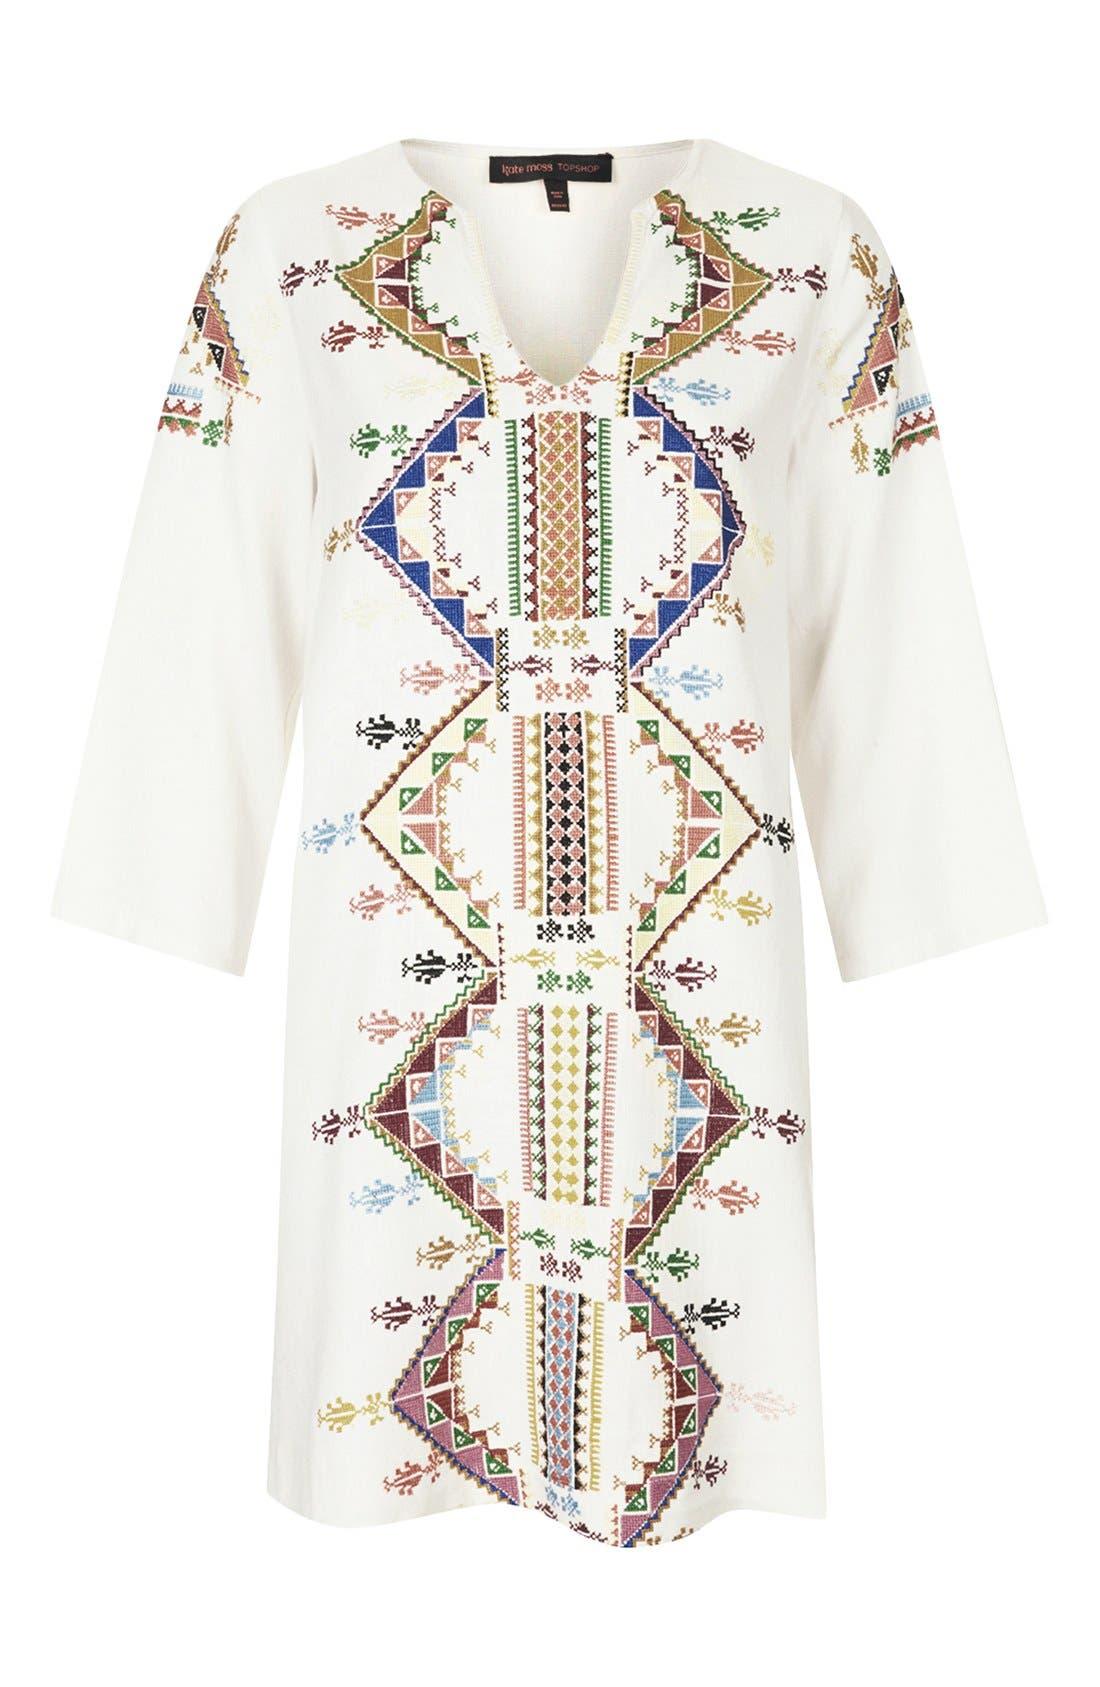 Alternate Image 3  - Kate Moss for Topshop Embroidered Smock Dress